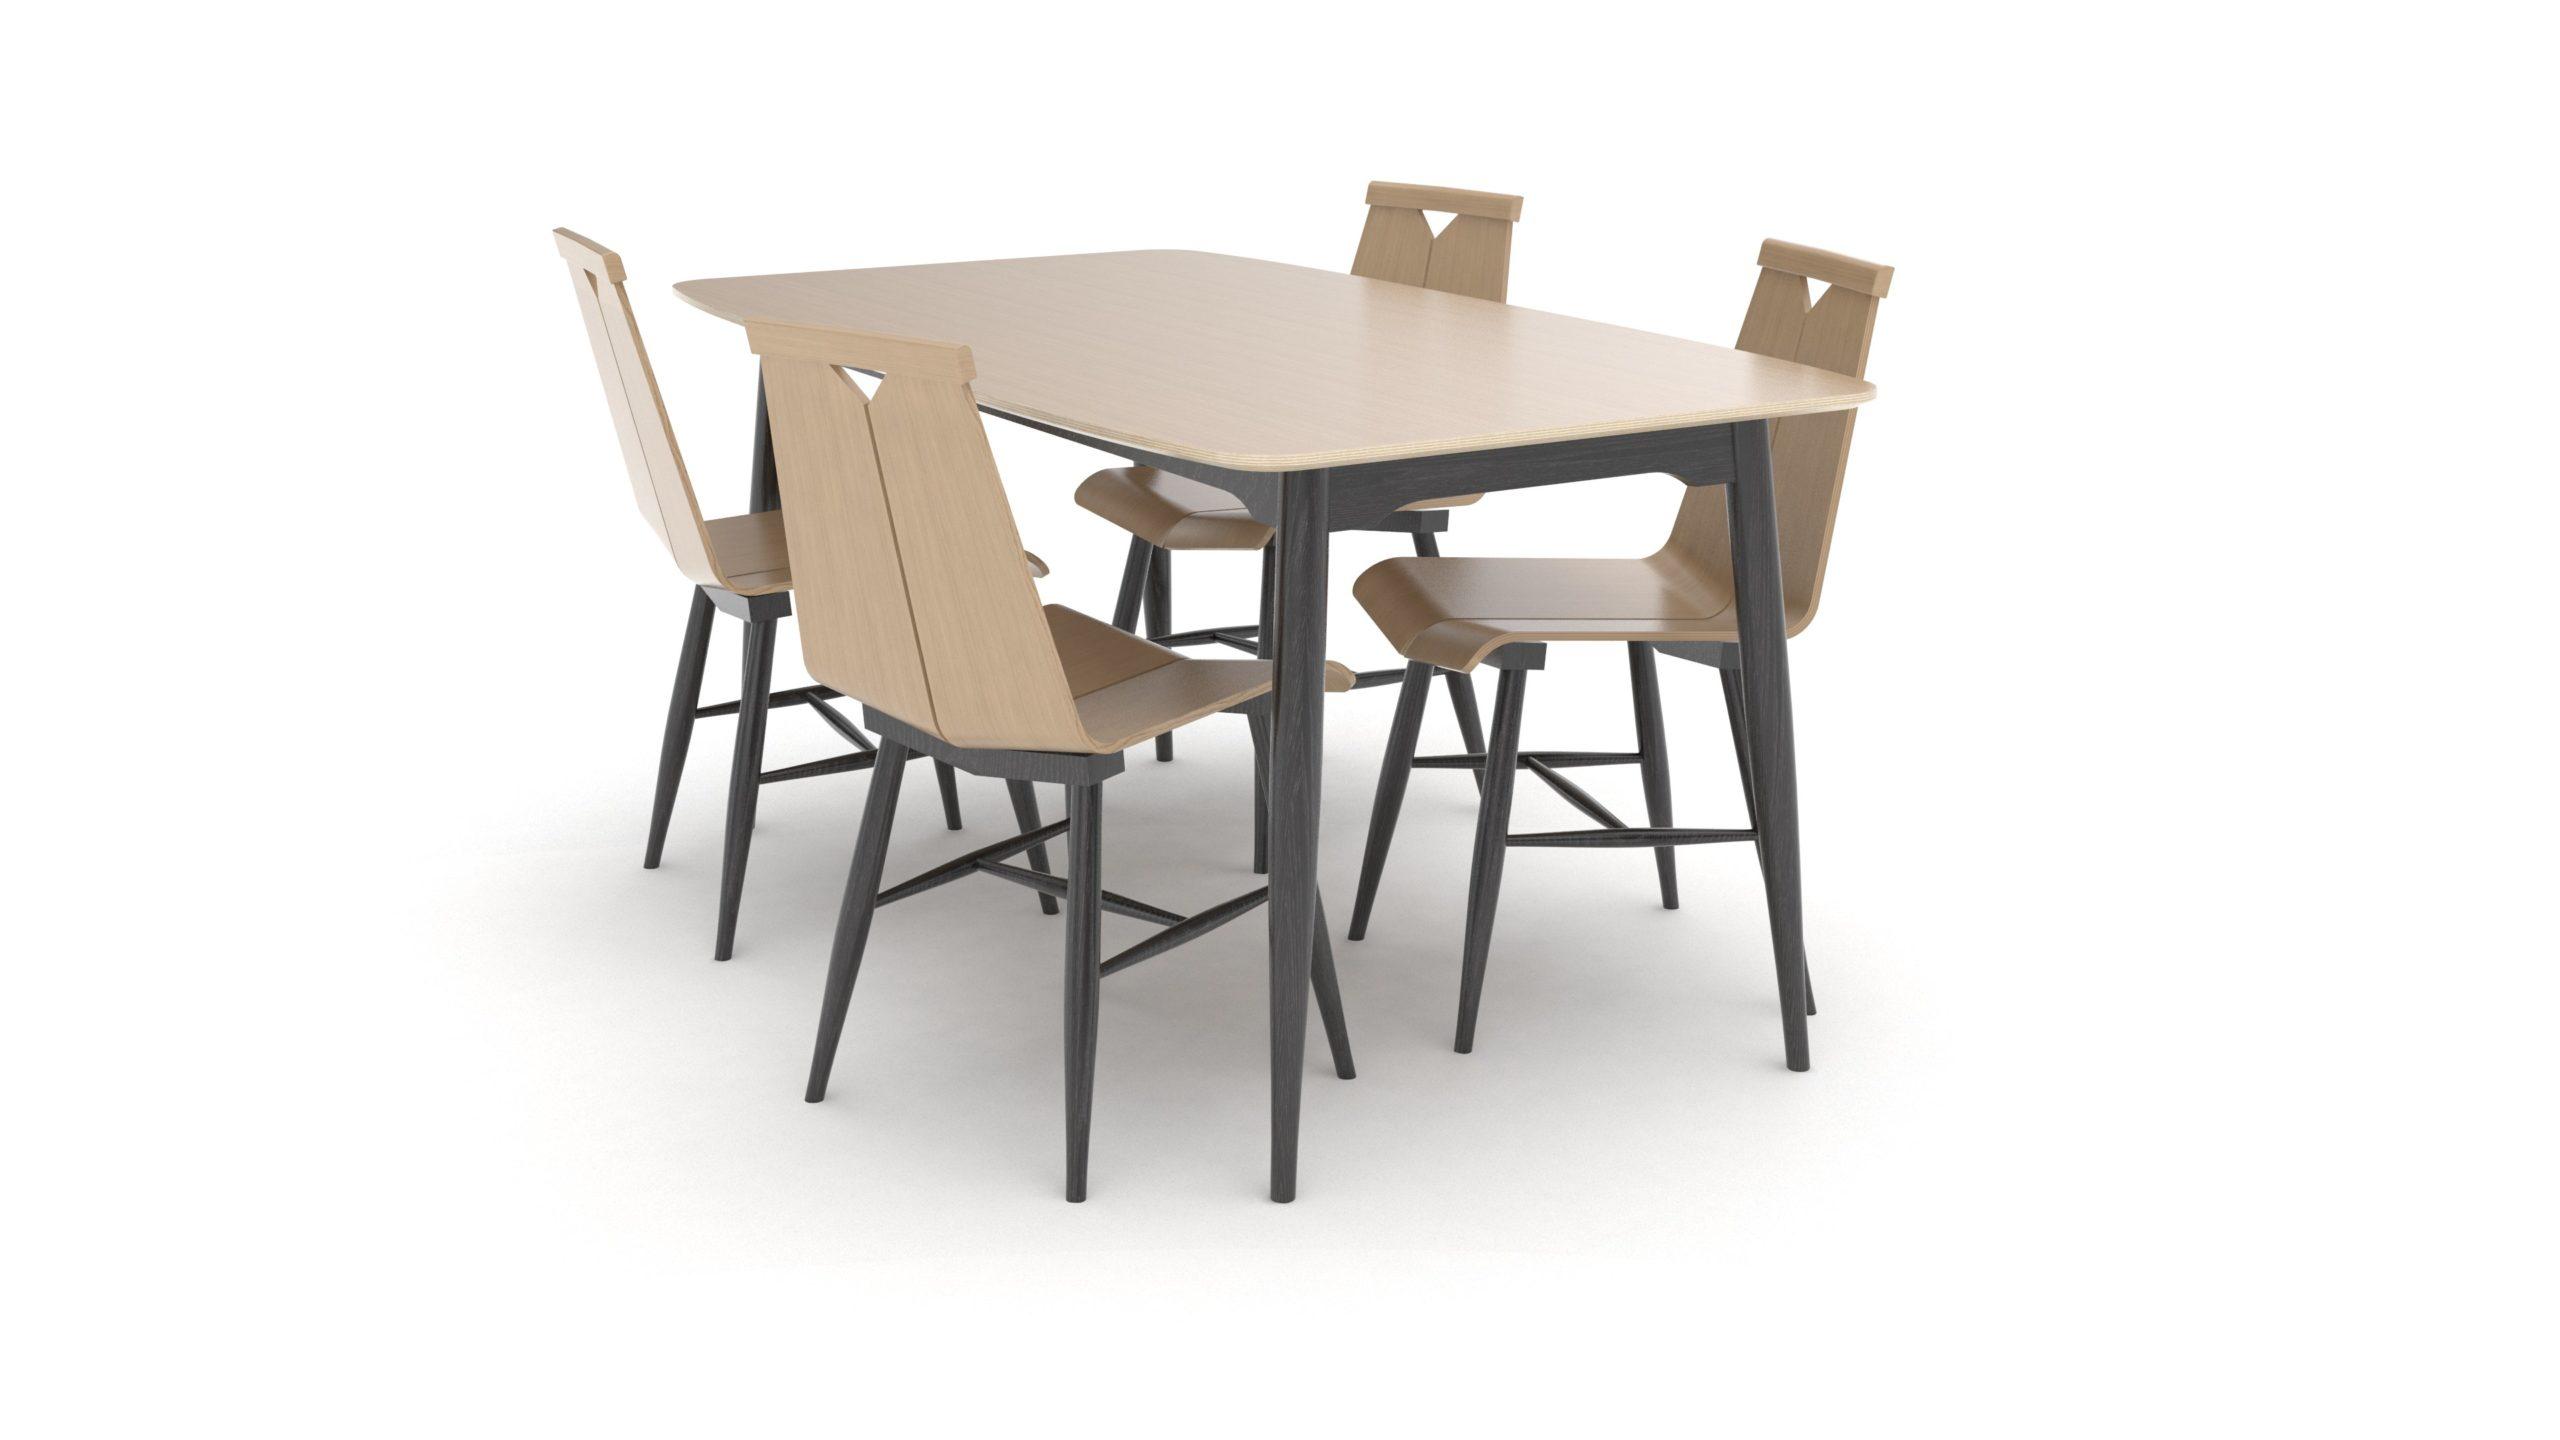 1960 Dining Set Design From Scandinavia